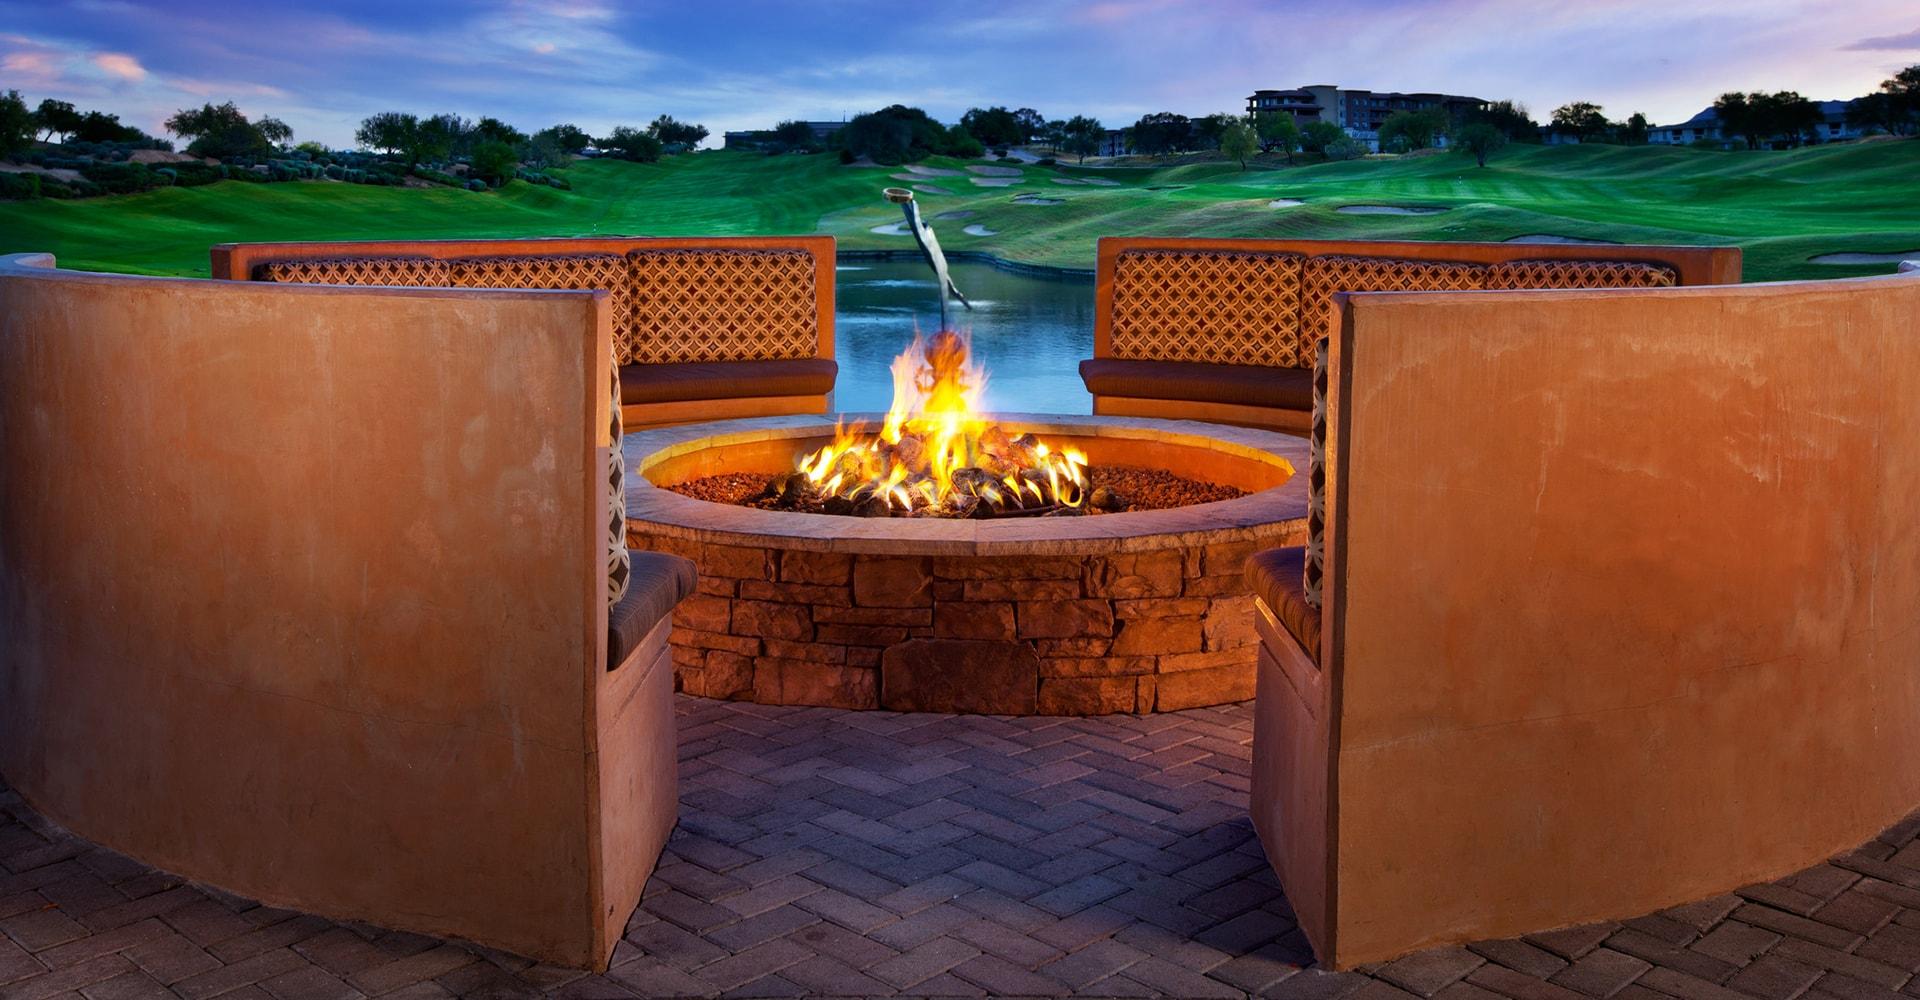 Kierland Westin Resort Fire PIt In Scottsdale Arizona